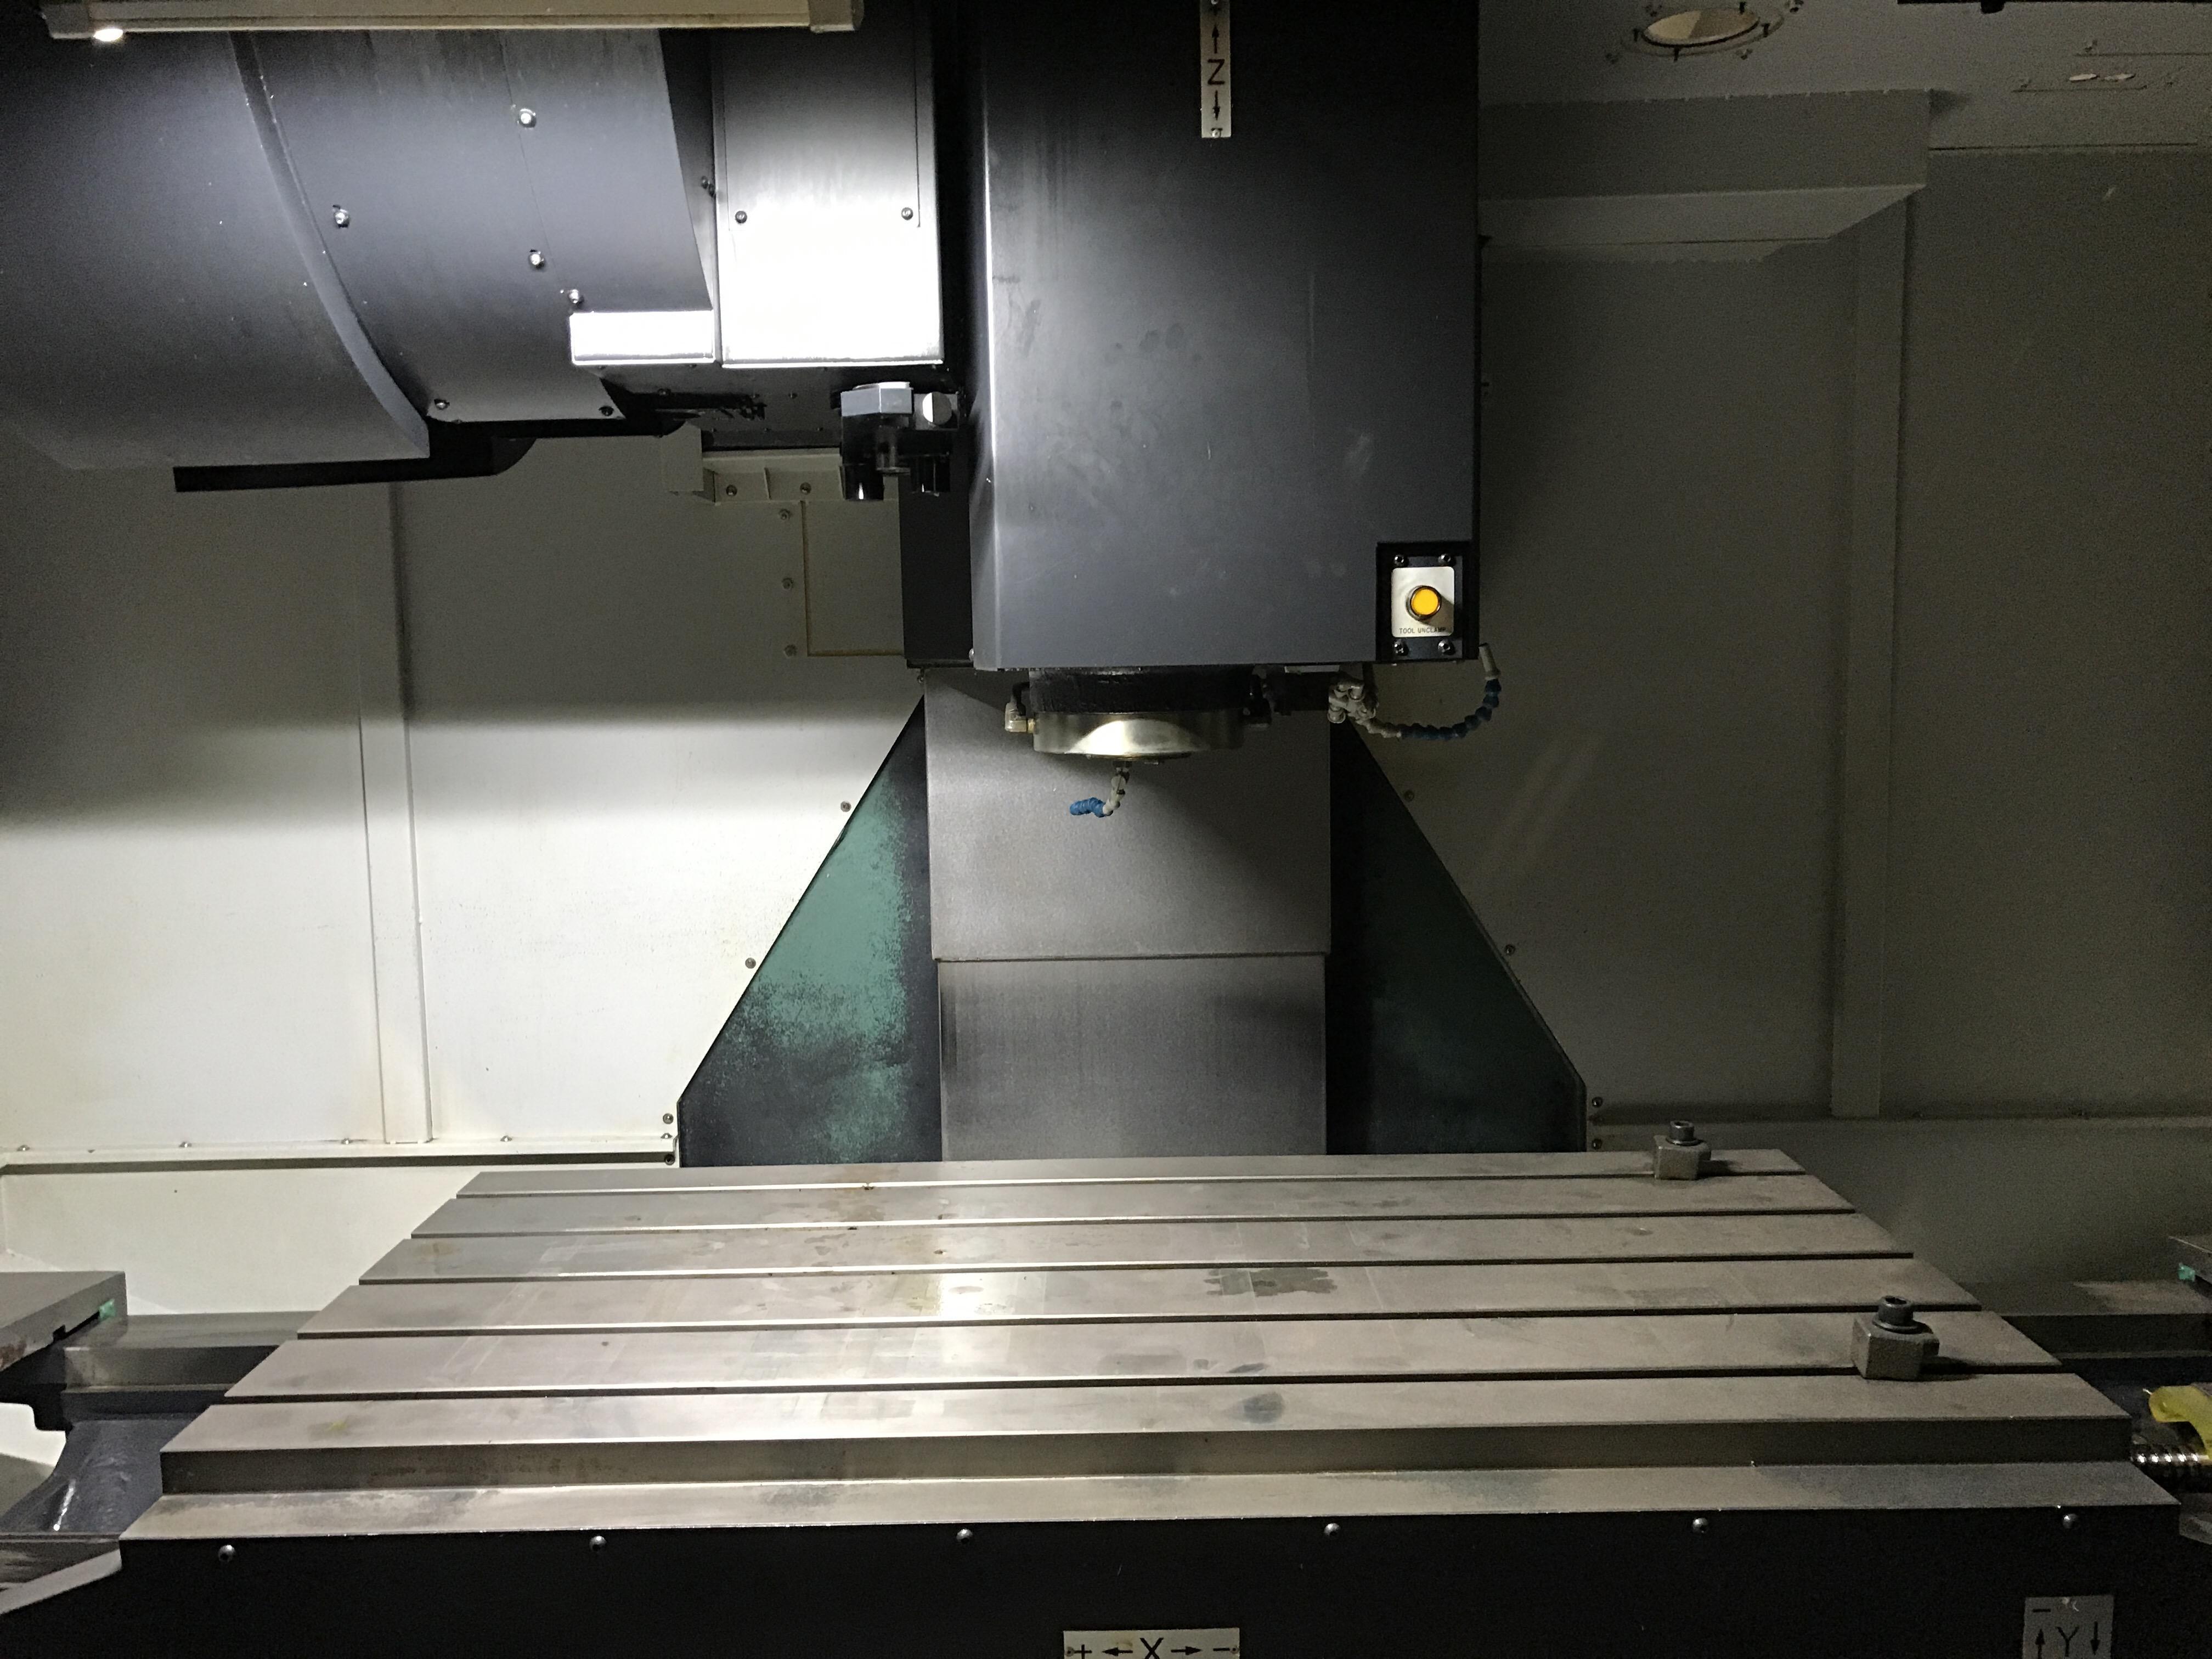 2015 Doosan Mynx 6500 - Vertical Machining Center